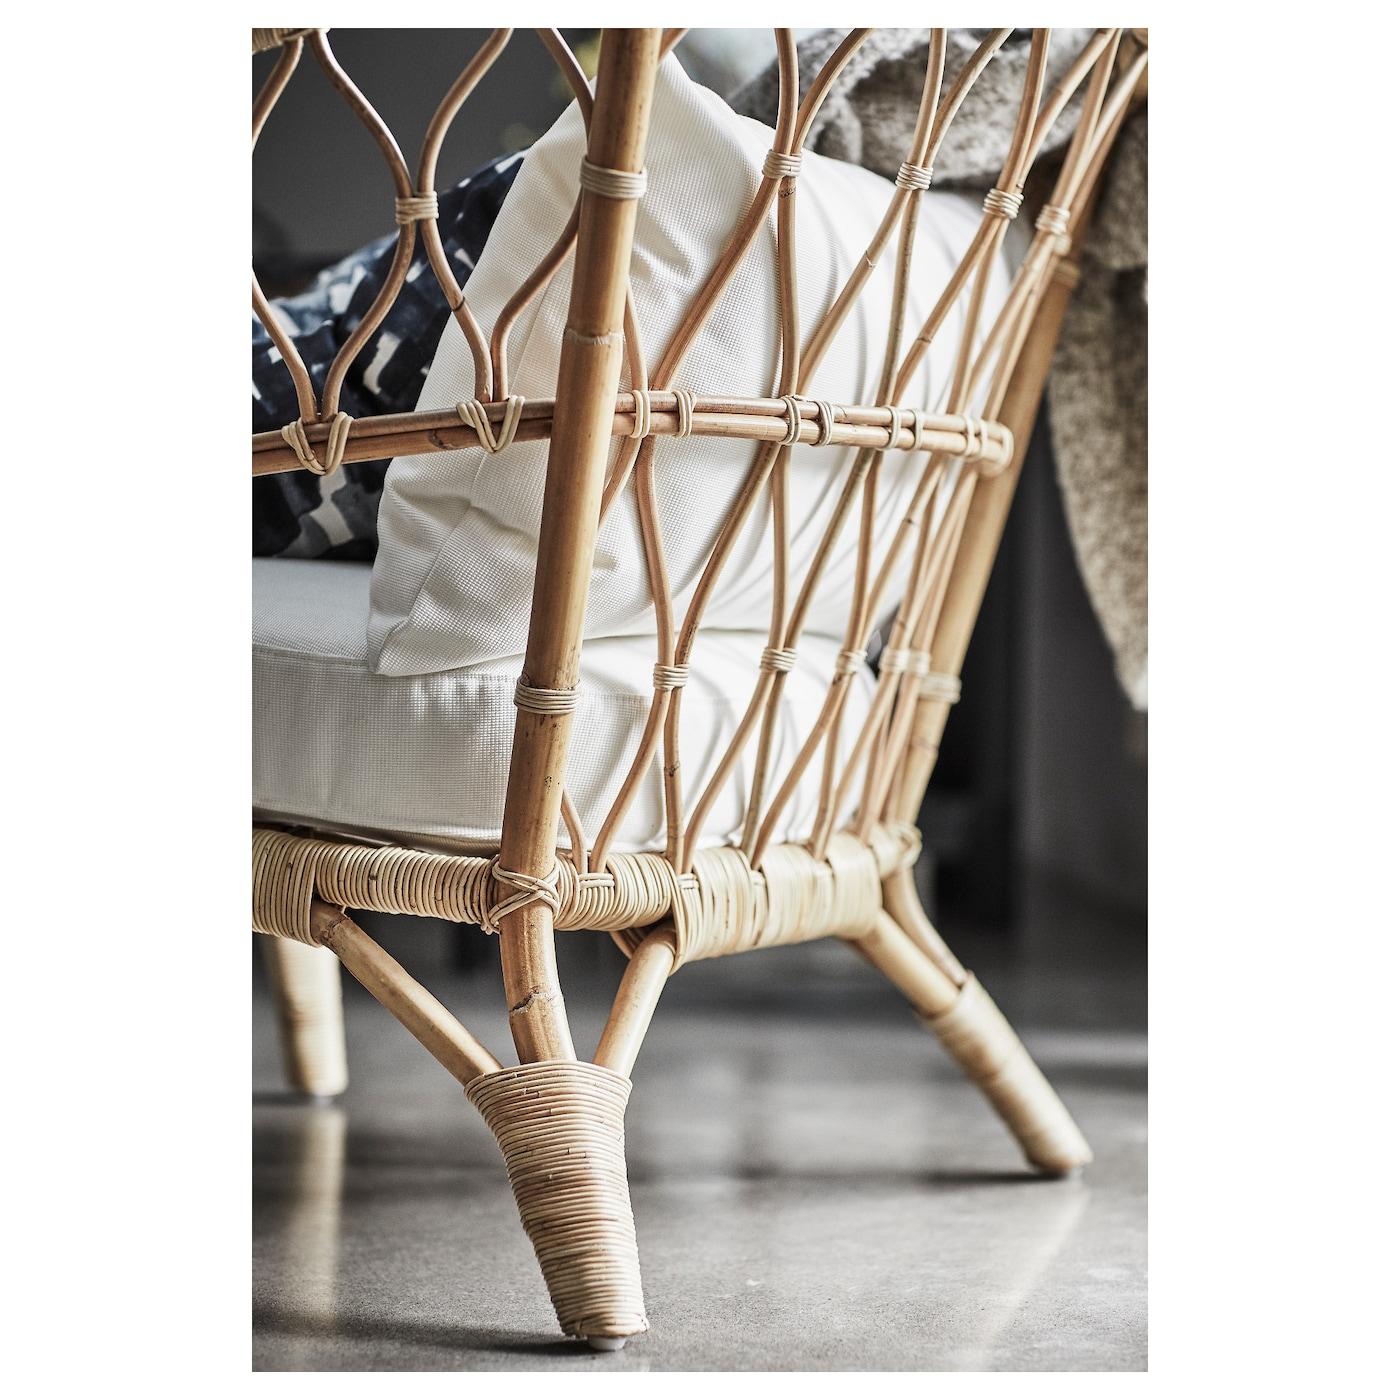 stockholm 2017 fauteuil avec coussin rotin r st nga blanc. Black Bedroom Furniture Sets. Home Design Ideas